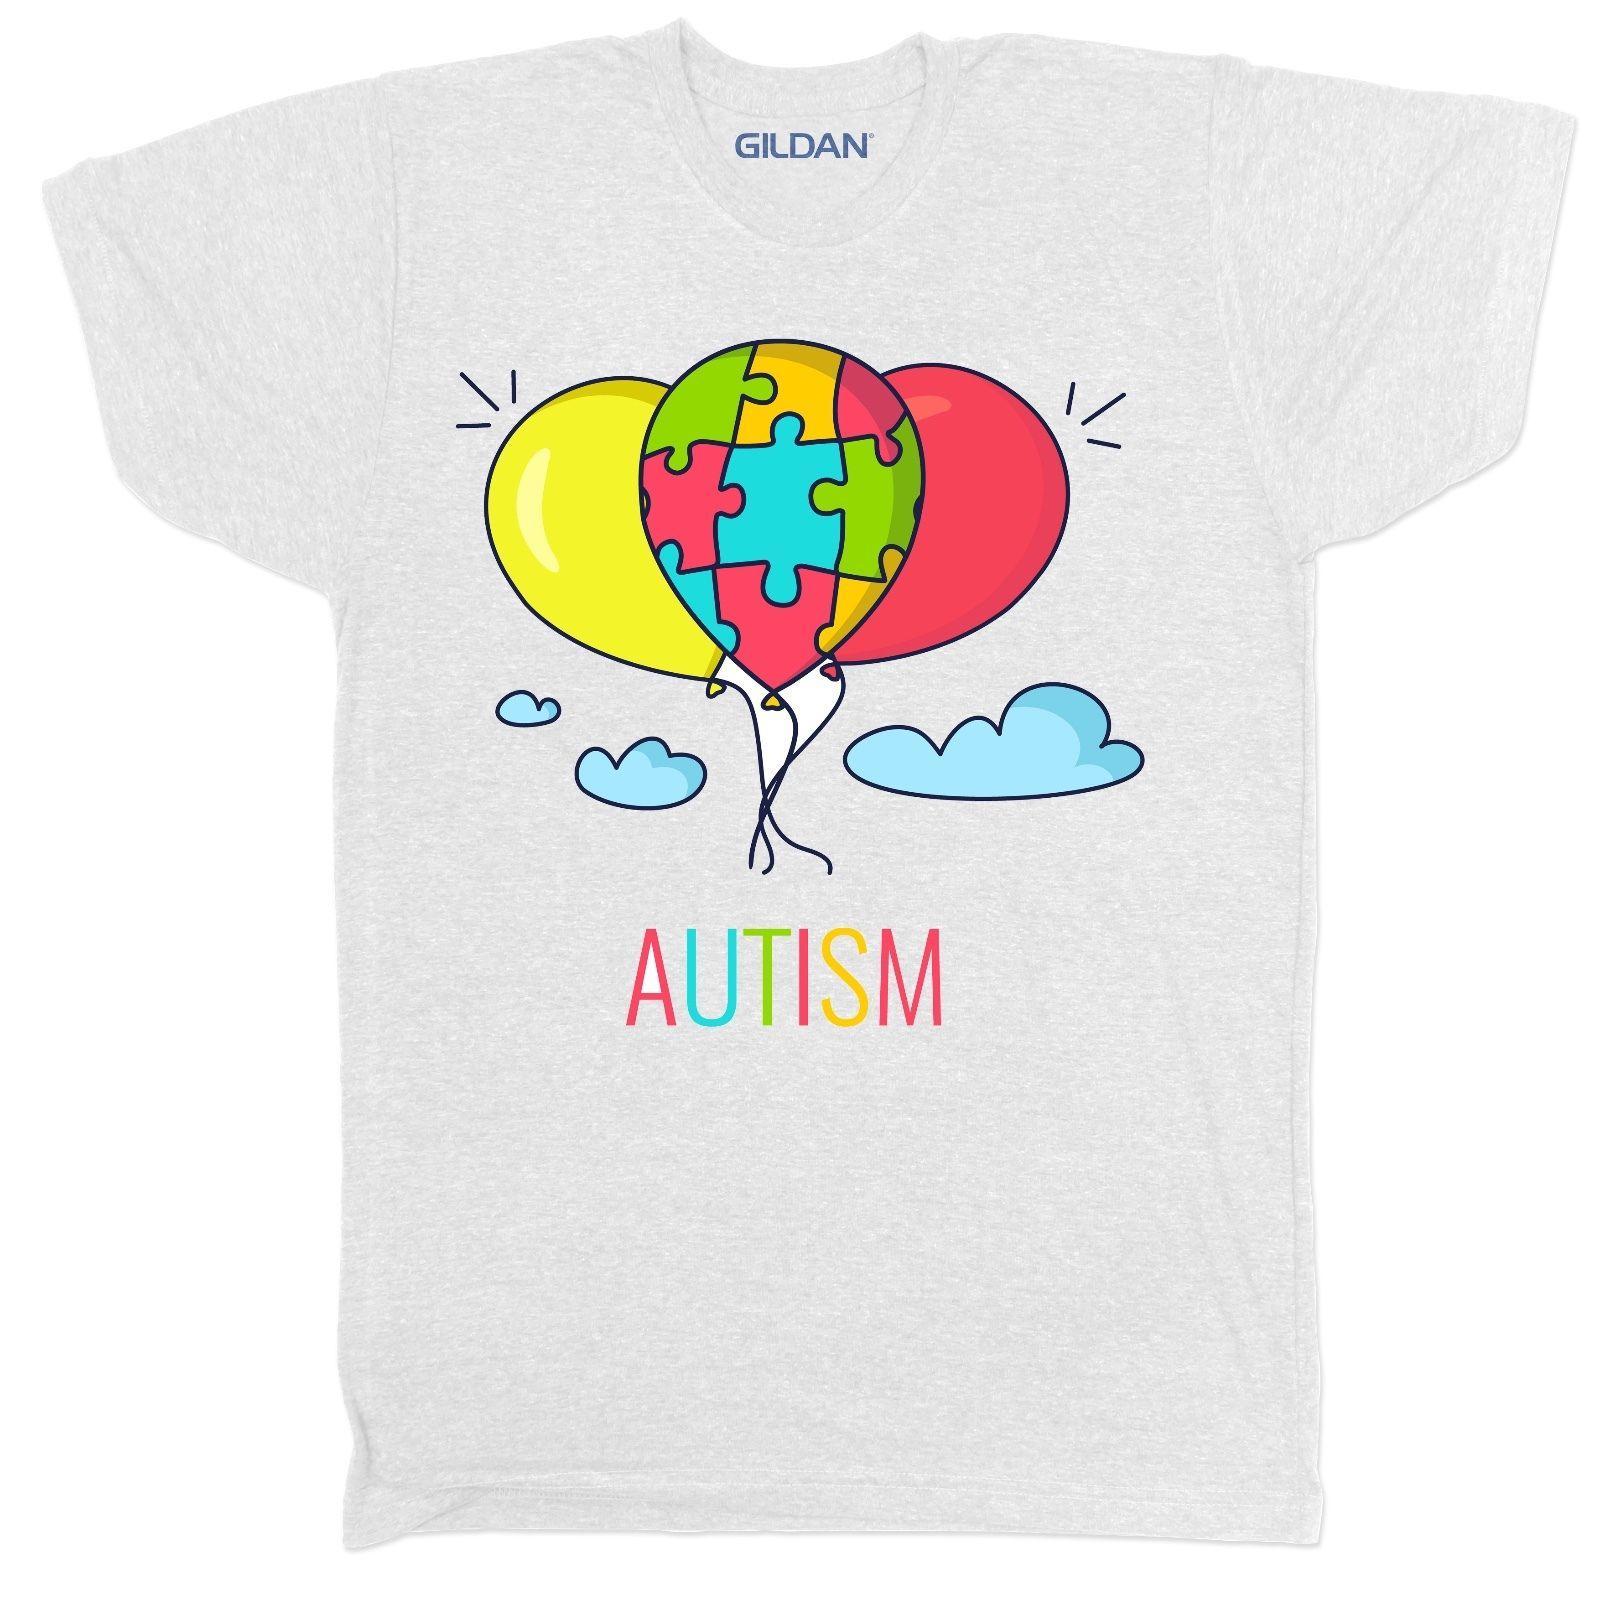 91c612276 AUTISM AWARENESS AUTISM T SHIRT SUPPORT THE CAUSE MENS KIDS T SHIRT Fashion Shirt  Tee Shirt Designs From Teestotal, $11.01| DHgate.Com